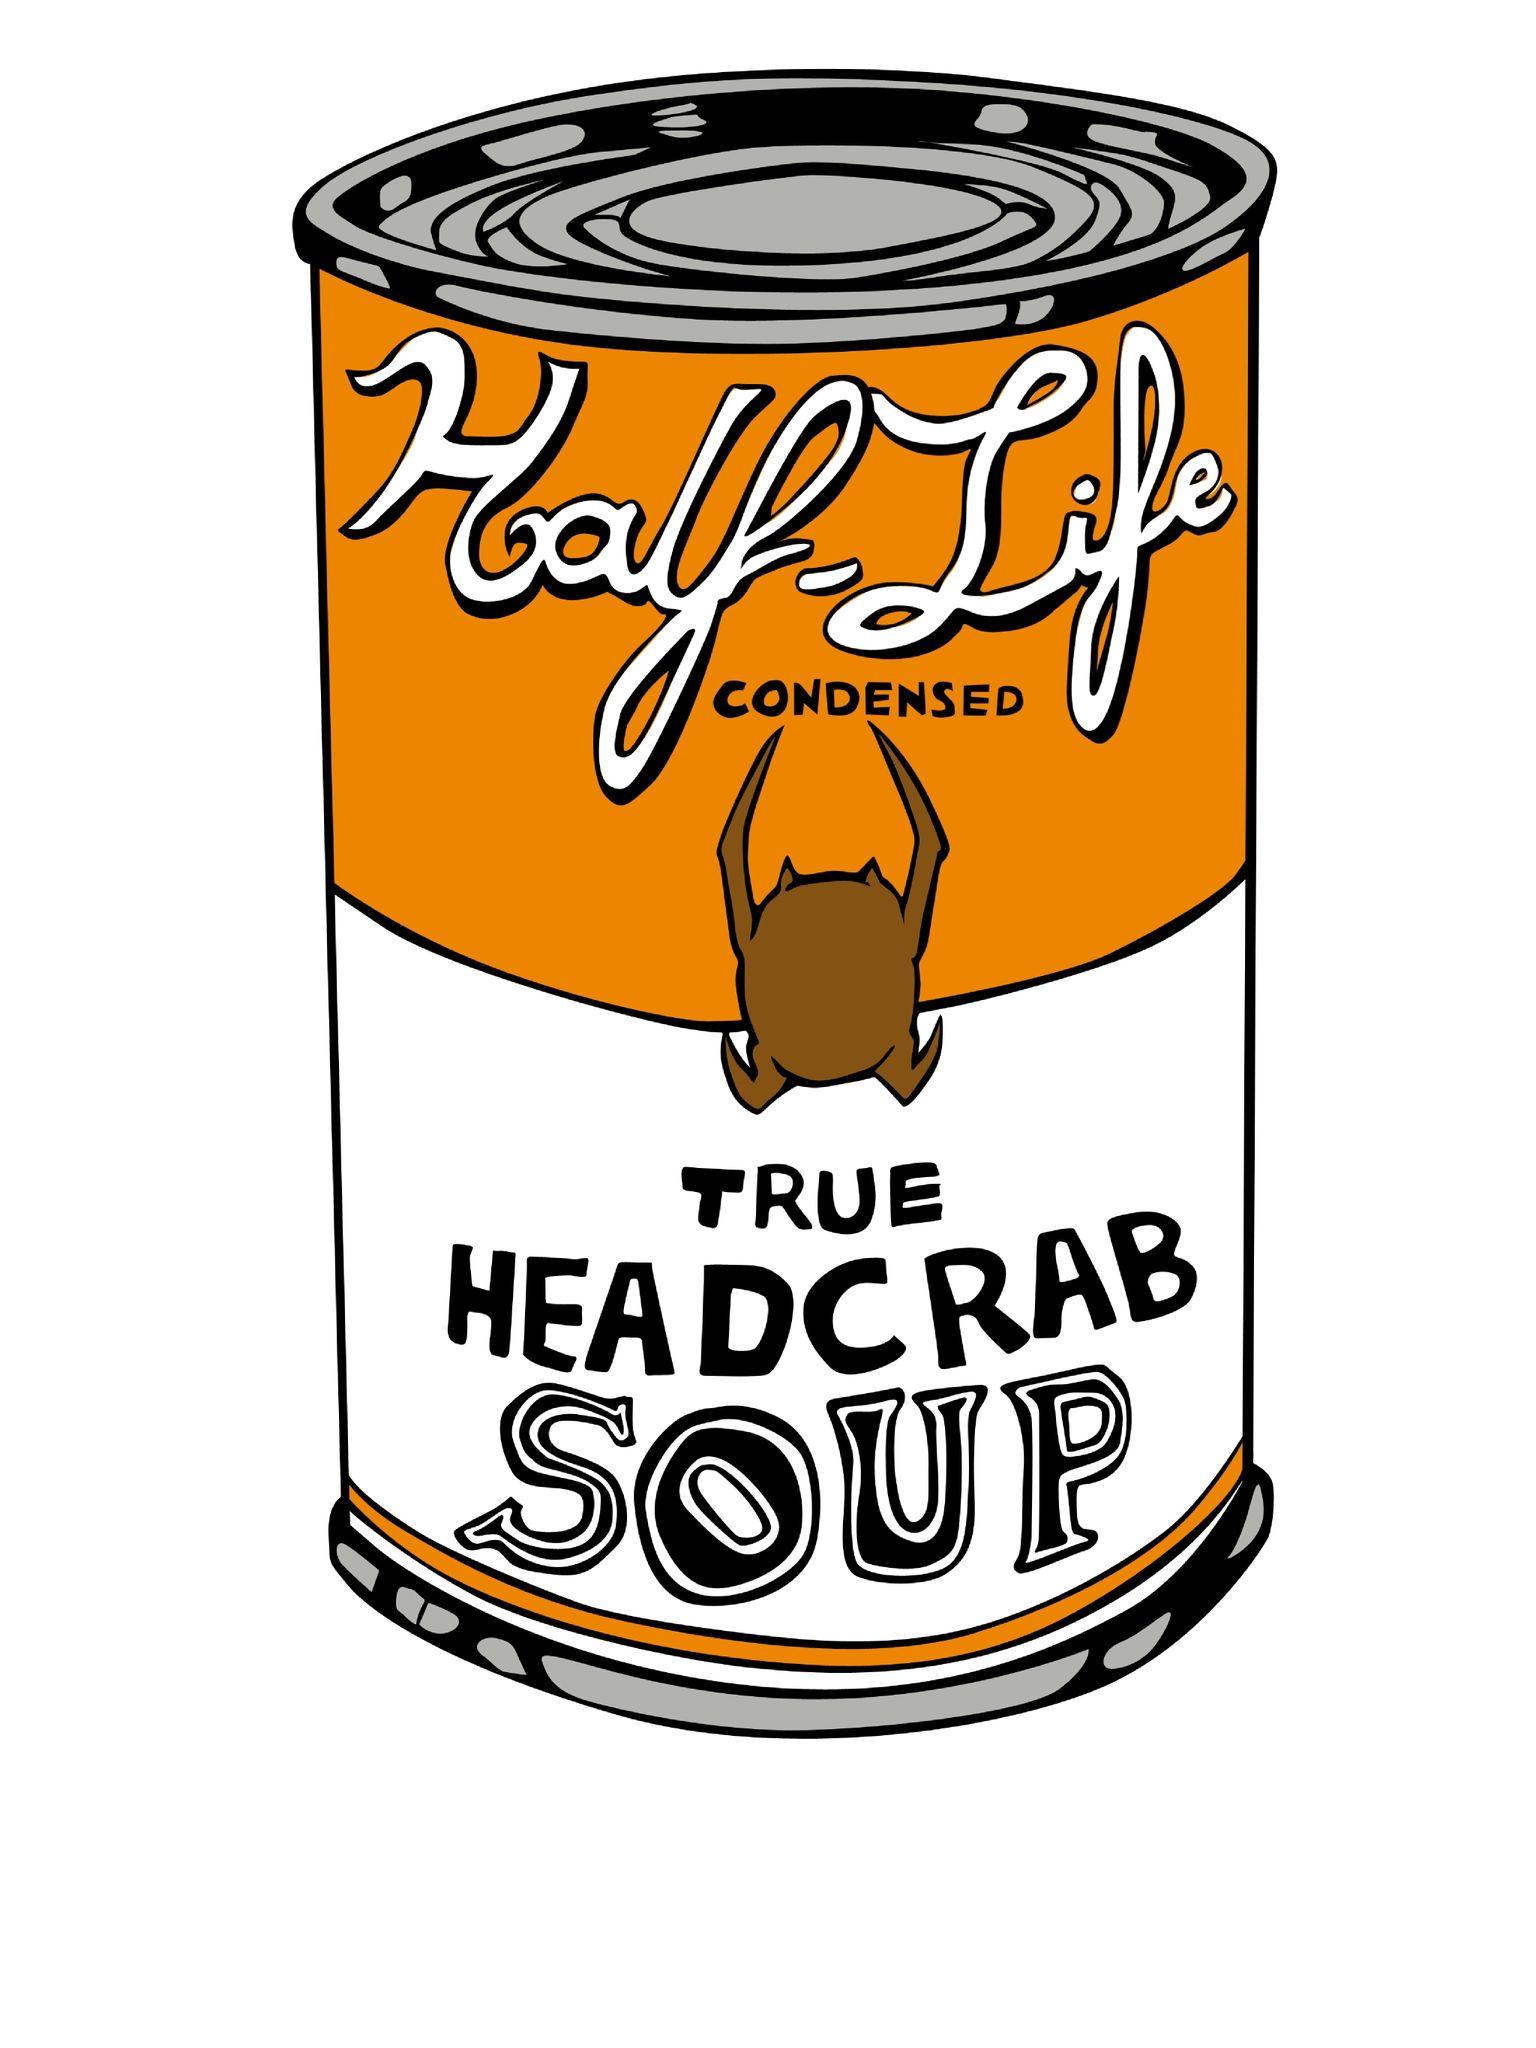 Halfcrab soup